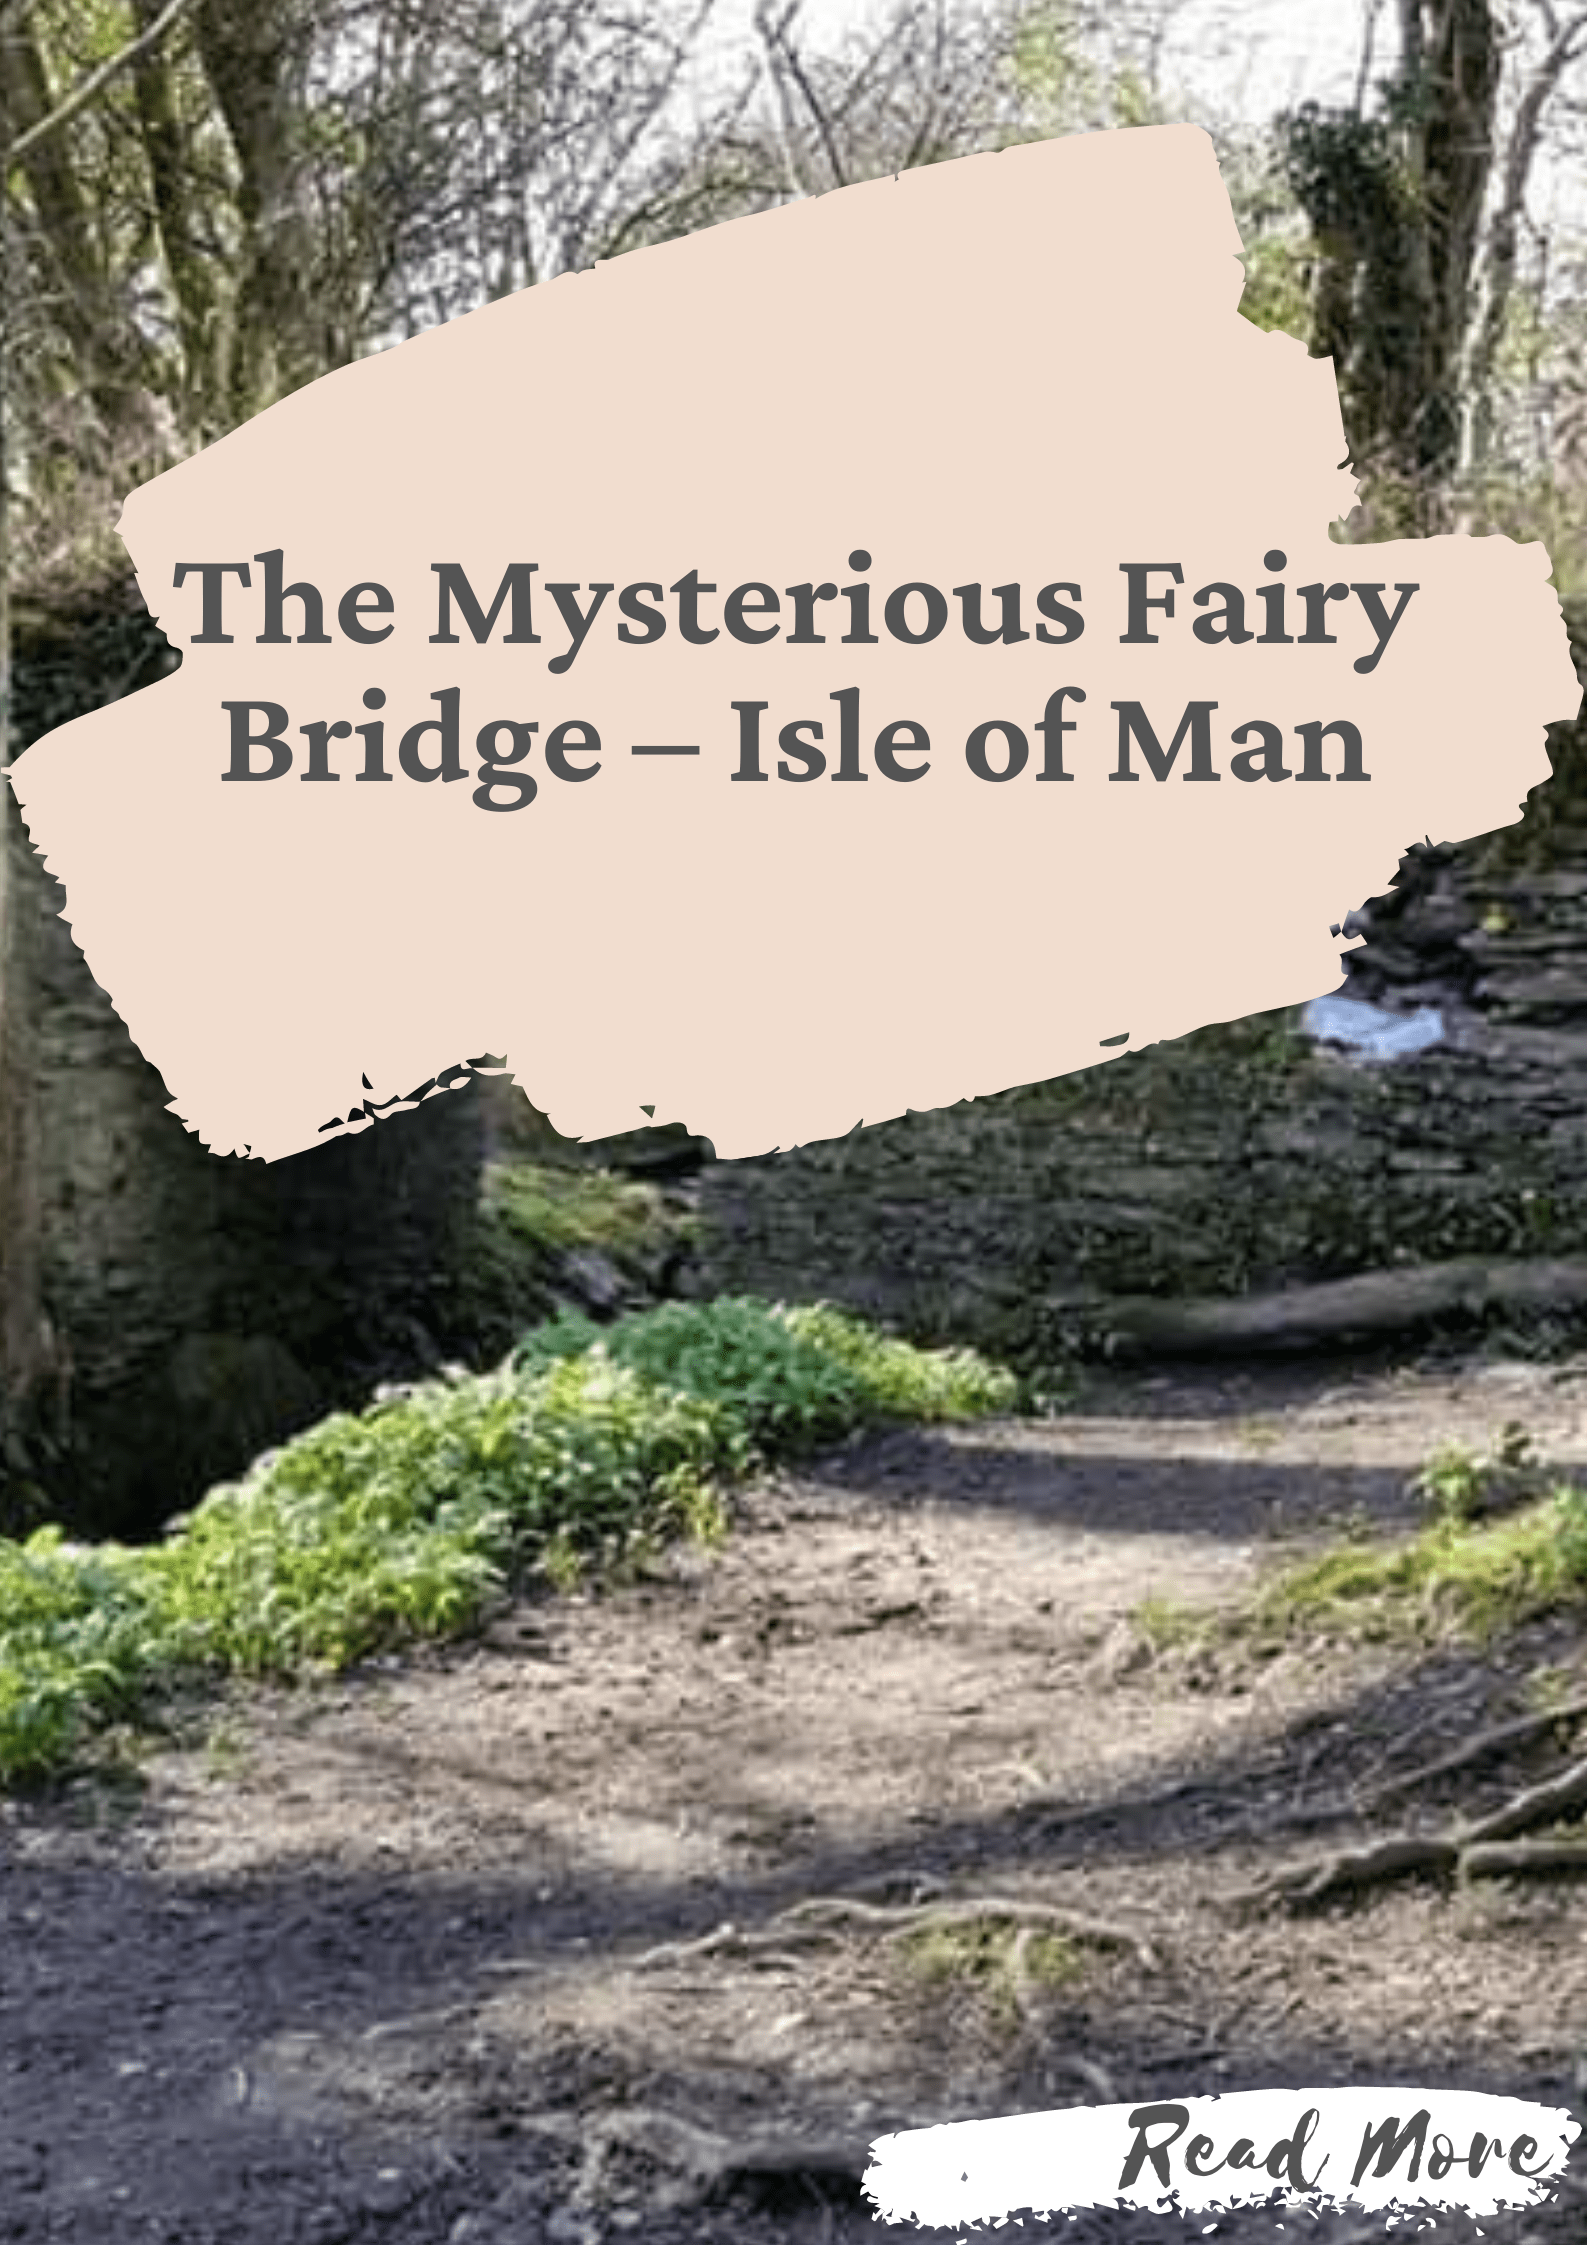 The Mysterious Fairy Bridge - Isle of Man